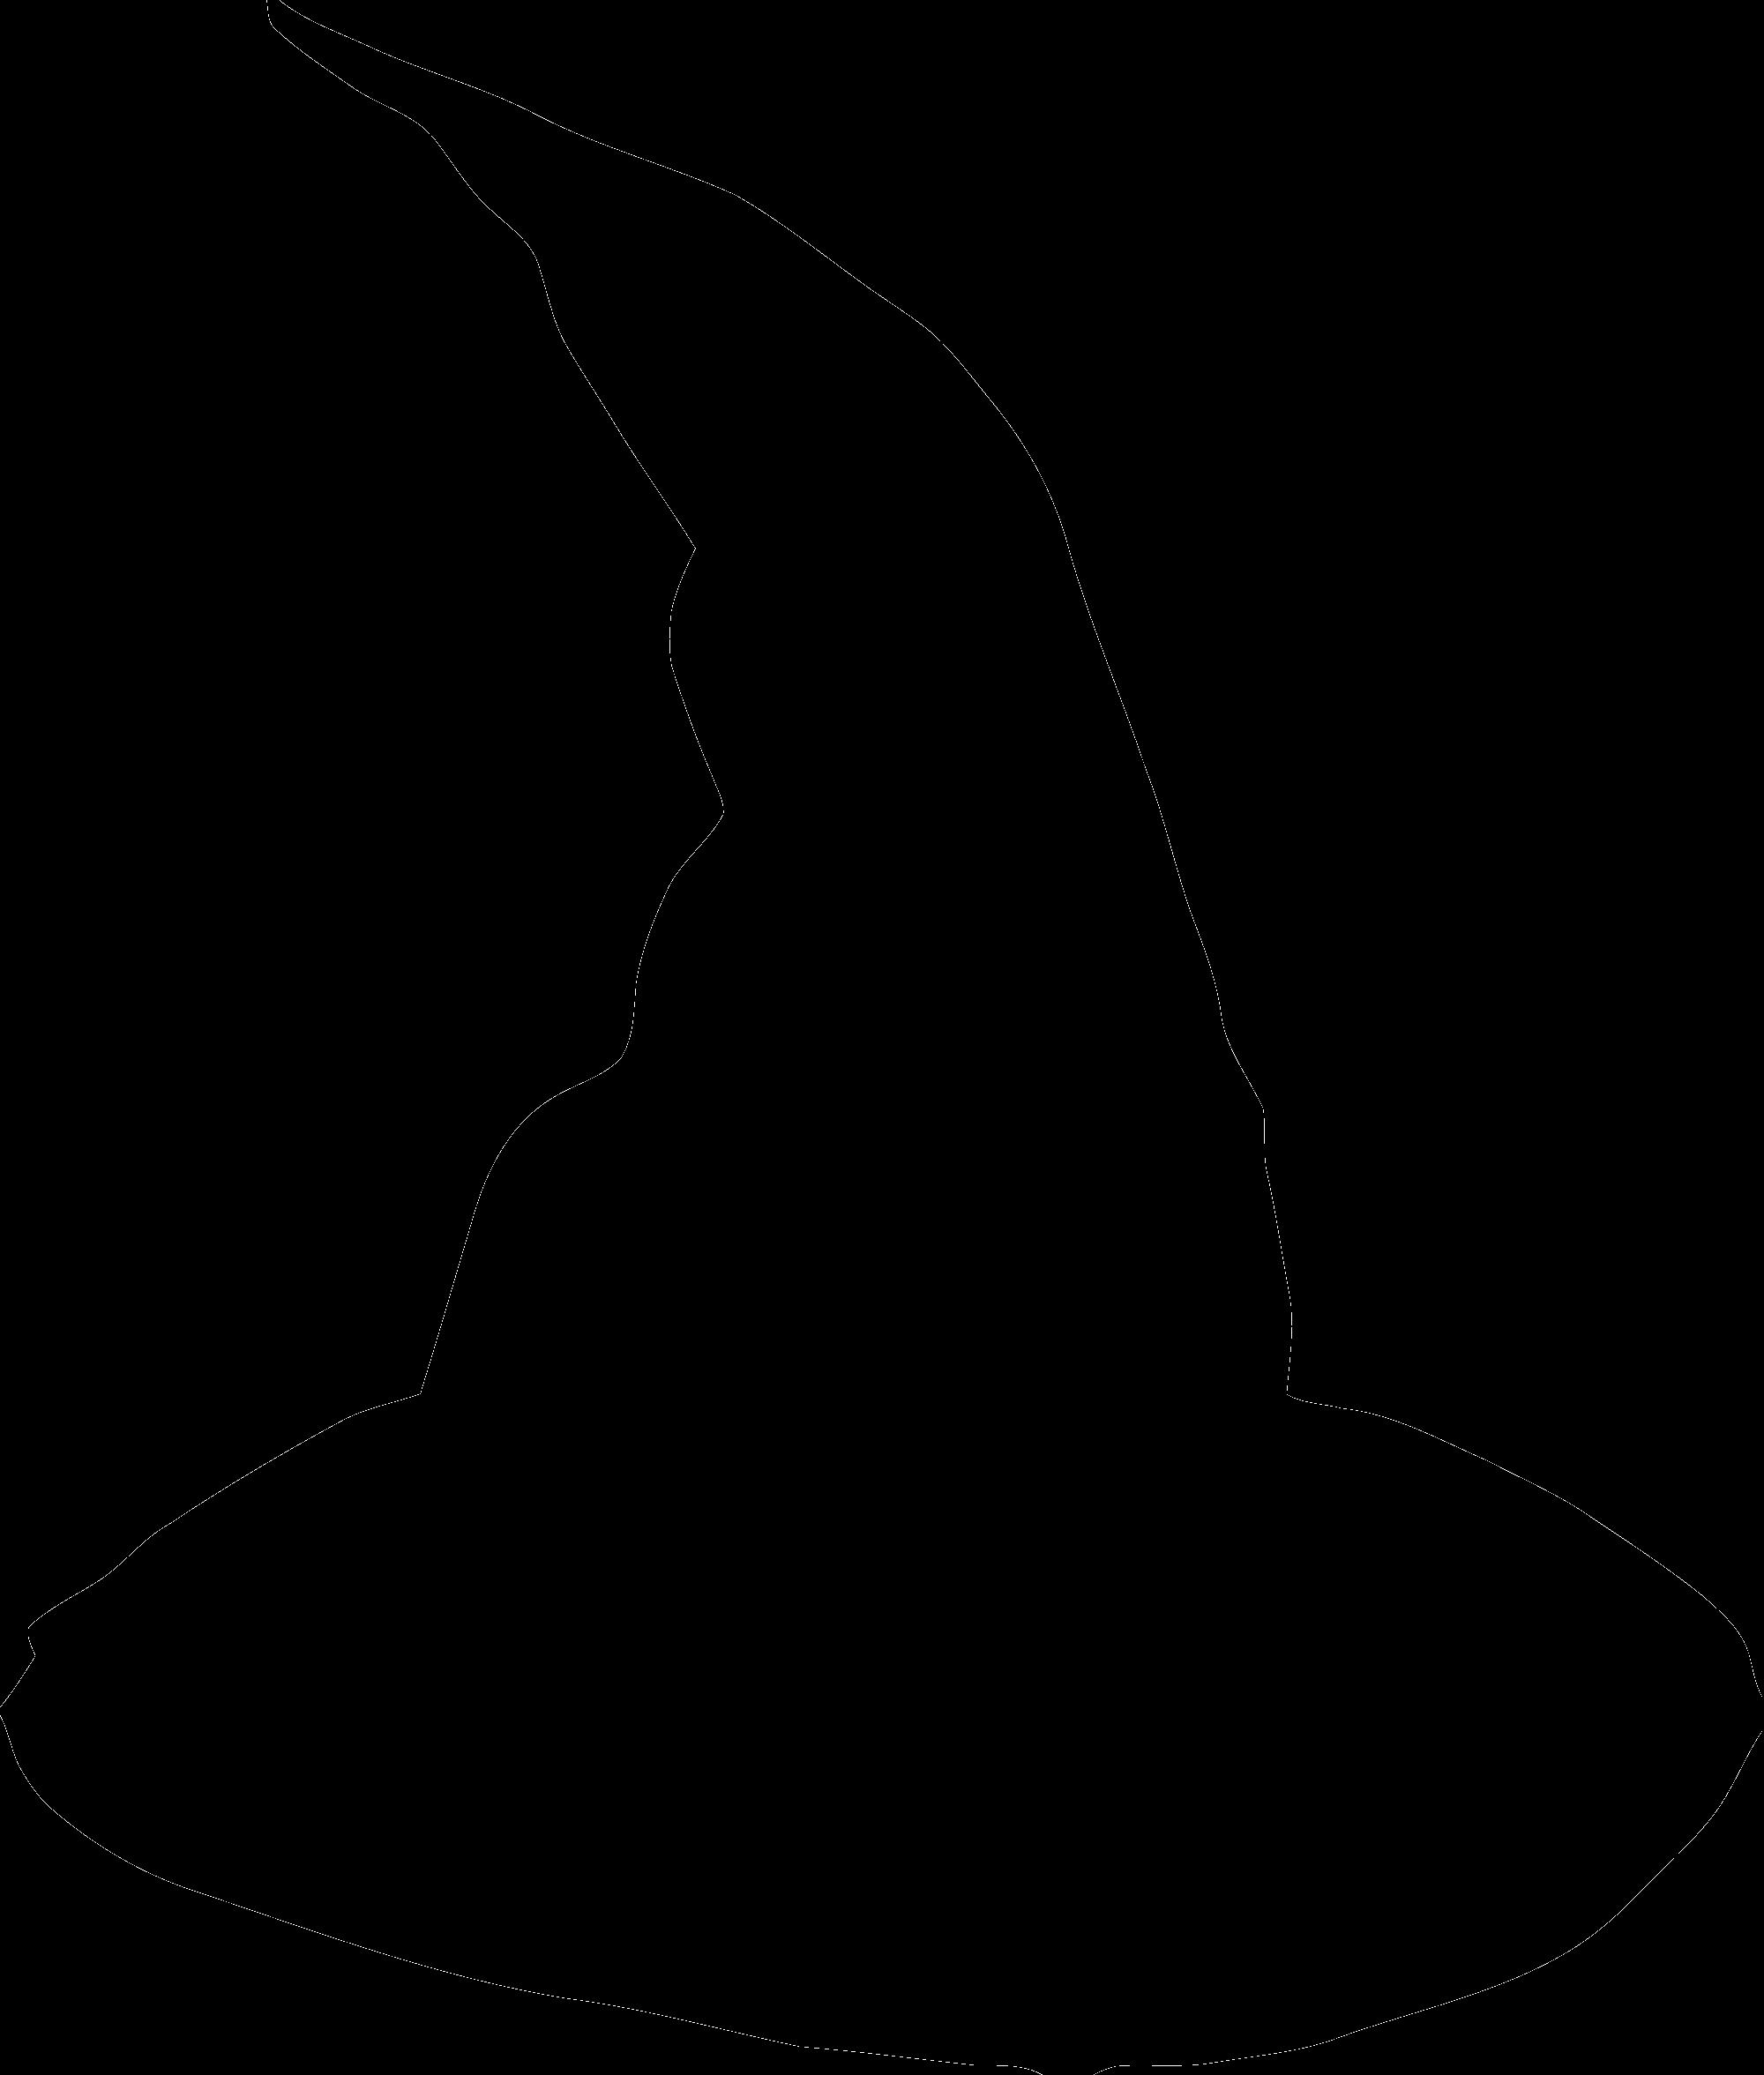 Witch Hat Transparent Background Witch Hat Transparent Cartoon Jing Fm